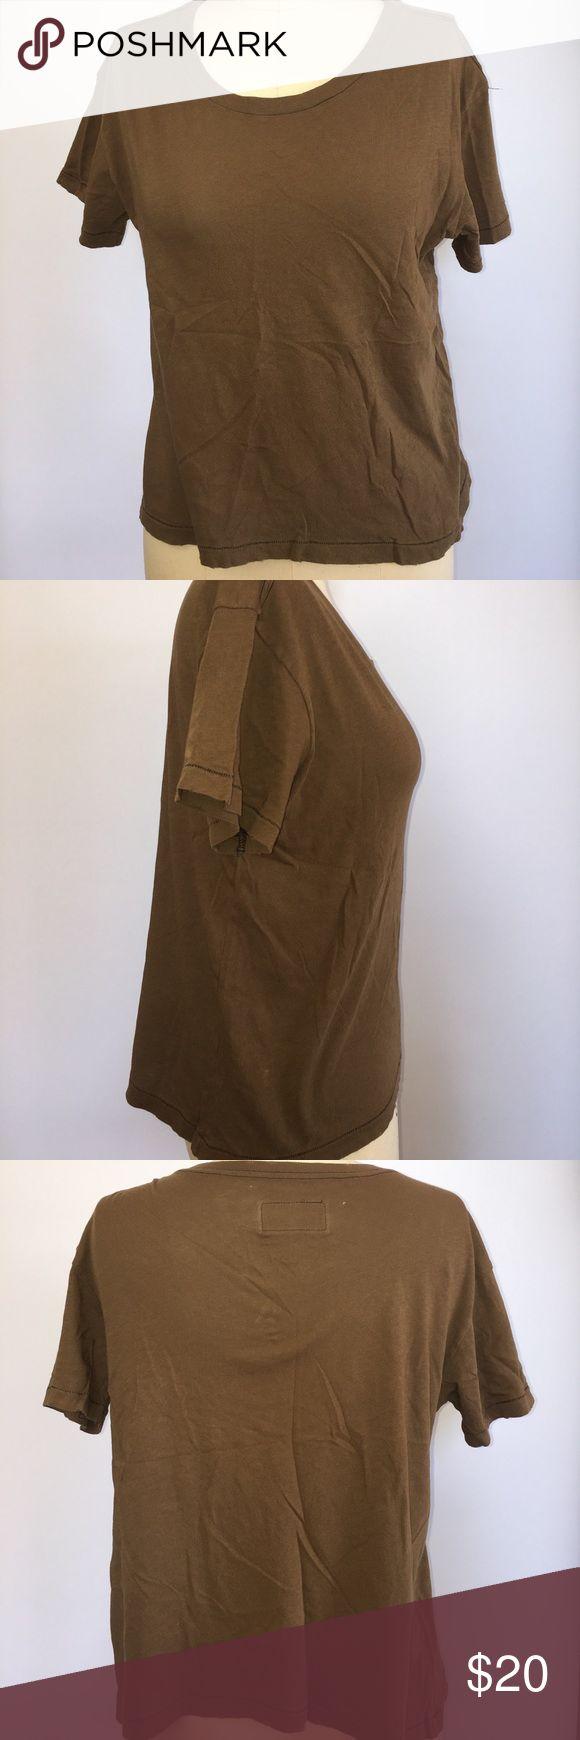 Current Elliot Women's Brown Sace T-shirt Current Elliot  Women's  Sace T-shirt Color Brown Size Small Current/Elliott Tops Tees - Short Sleeve